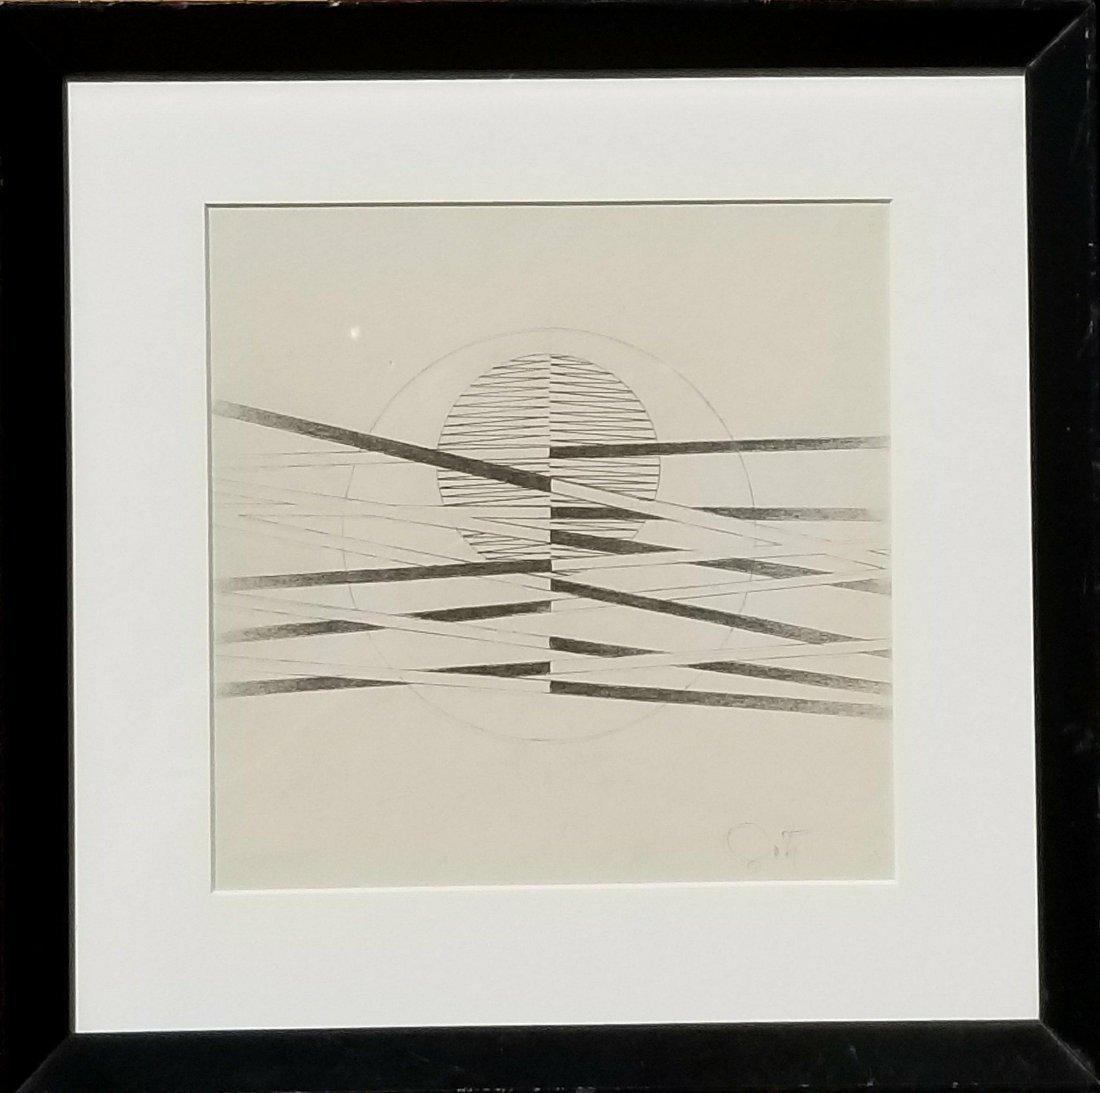 Jesus Rafael Soto (1923-2005) Pencil on Paper- Jesœs